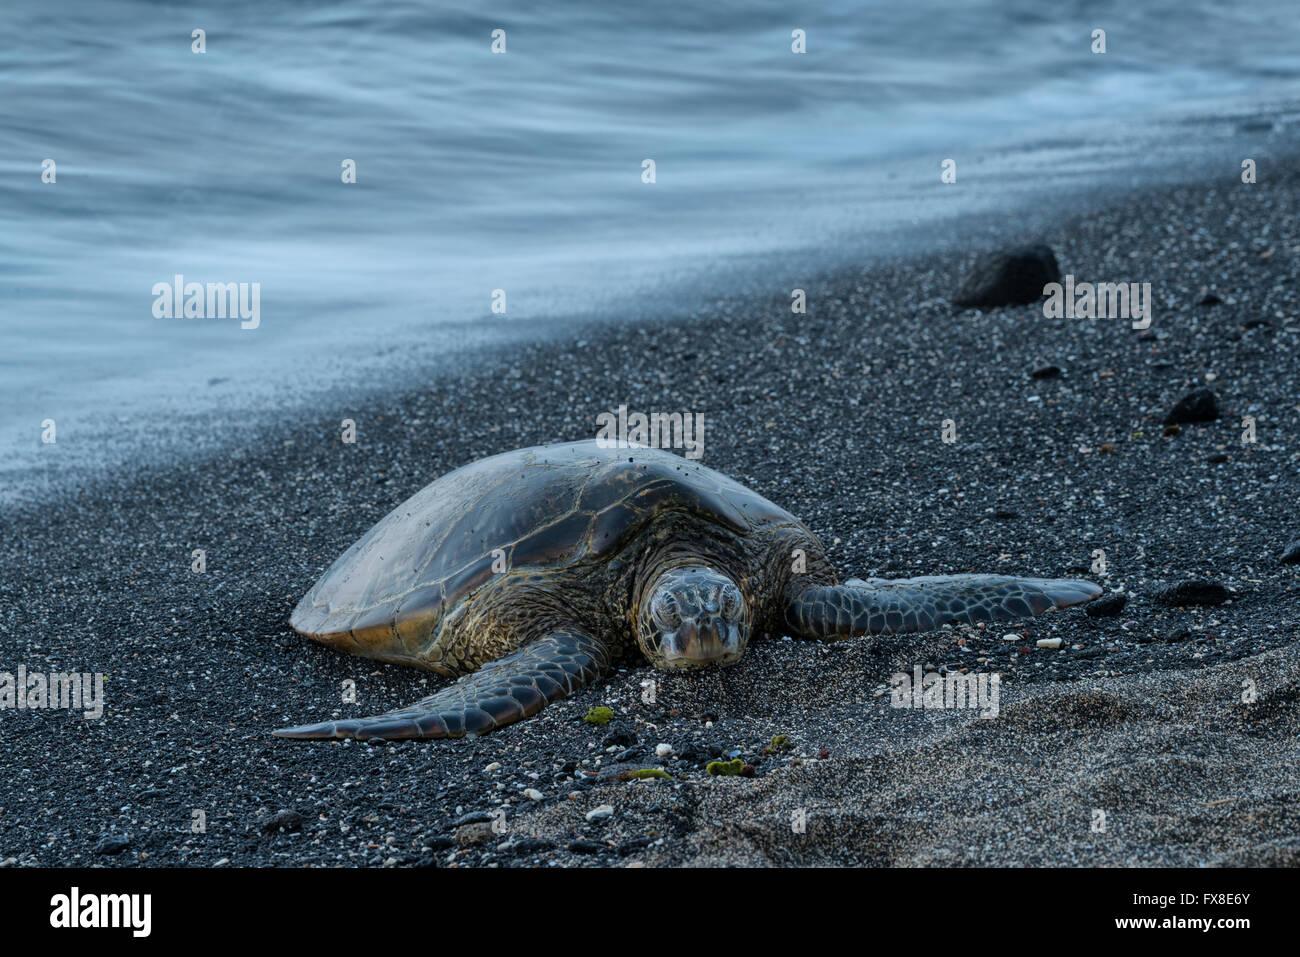 Kona, Big Island, Hawaii, USA Kaloko-Honokohau historischen Nationalpark, Meeresschildkröten am Strand, Stockfoto